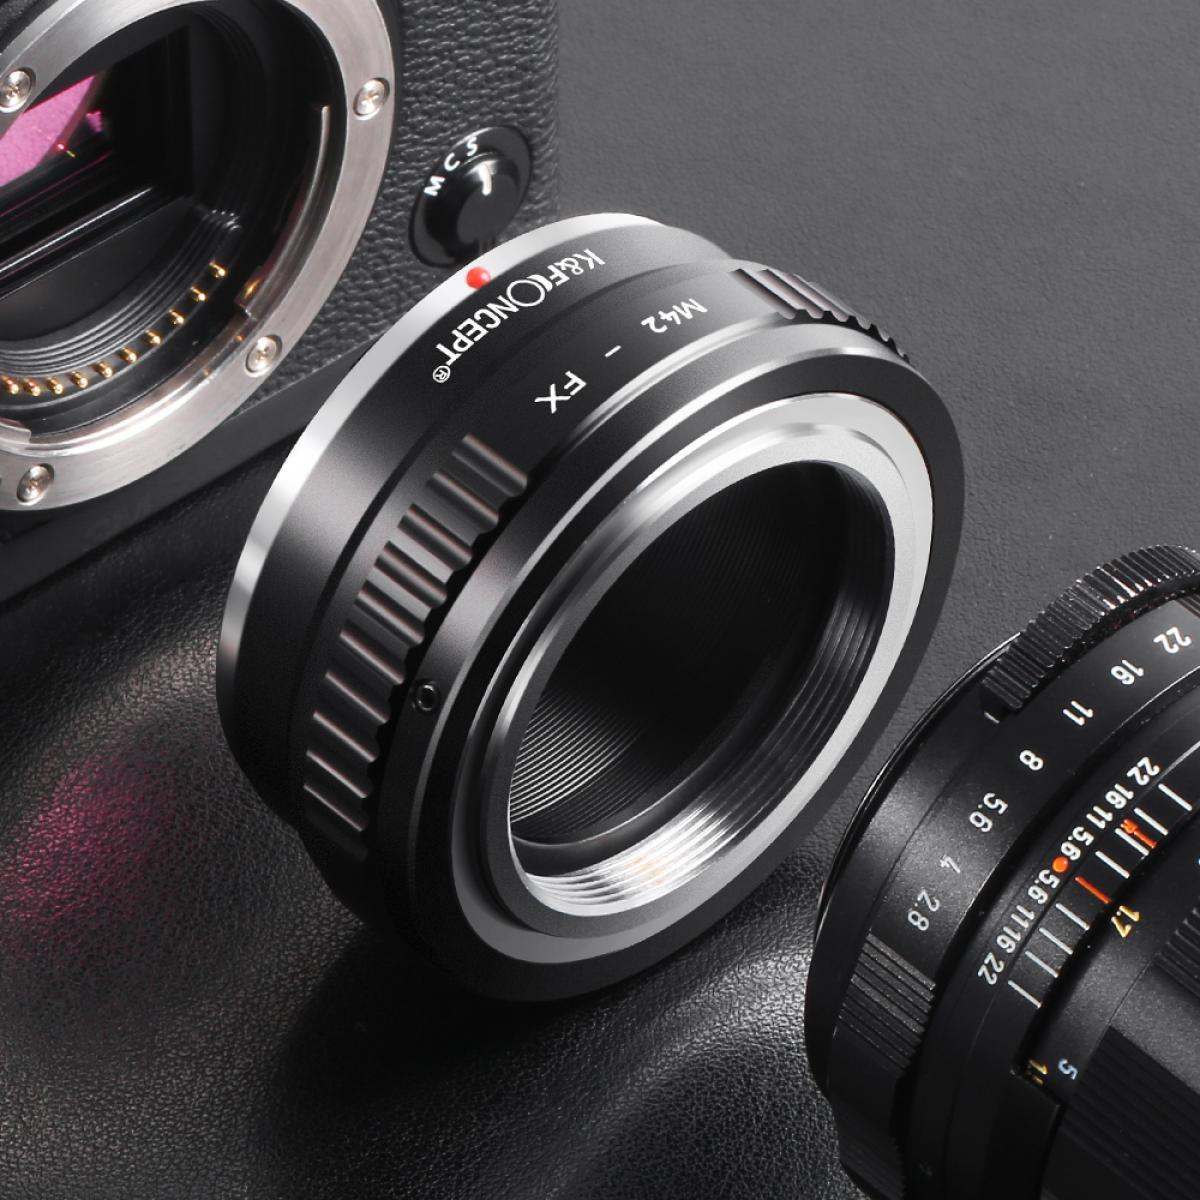 Lens Mount Adapter for M42 Mount Lens to Fujifilm Fuji X-Series X FX Mount Mirrorless Camera Body,Fits for Fuji XT2 XT20 XE3 XT1 X-T2